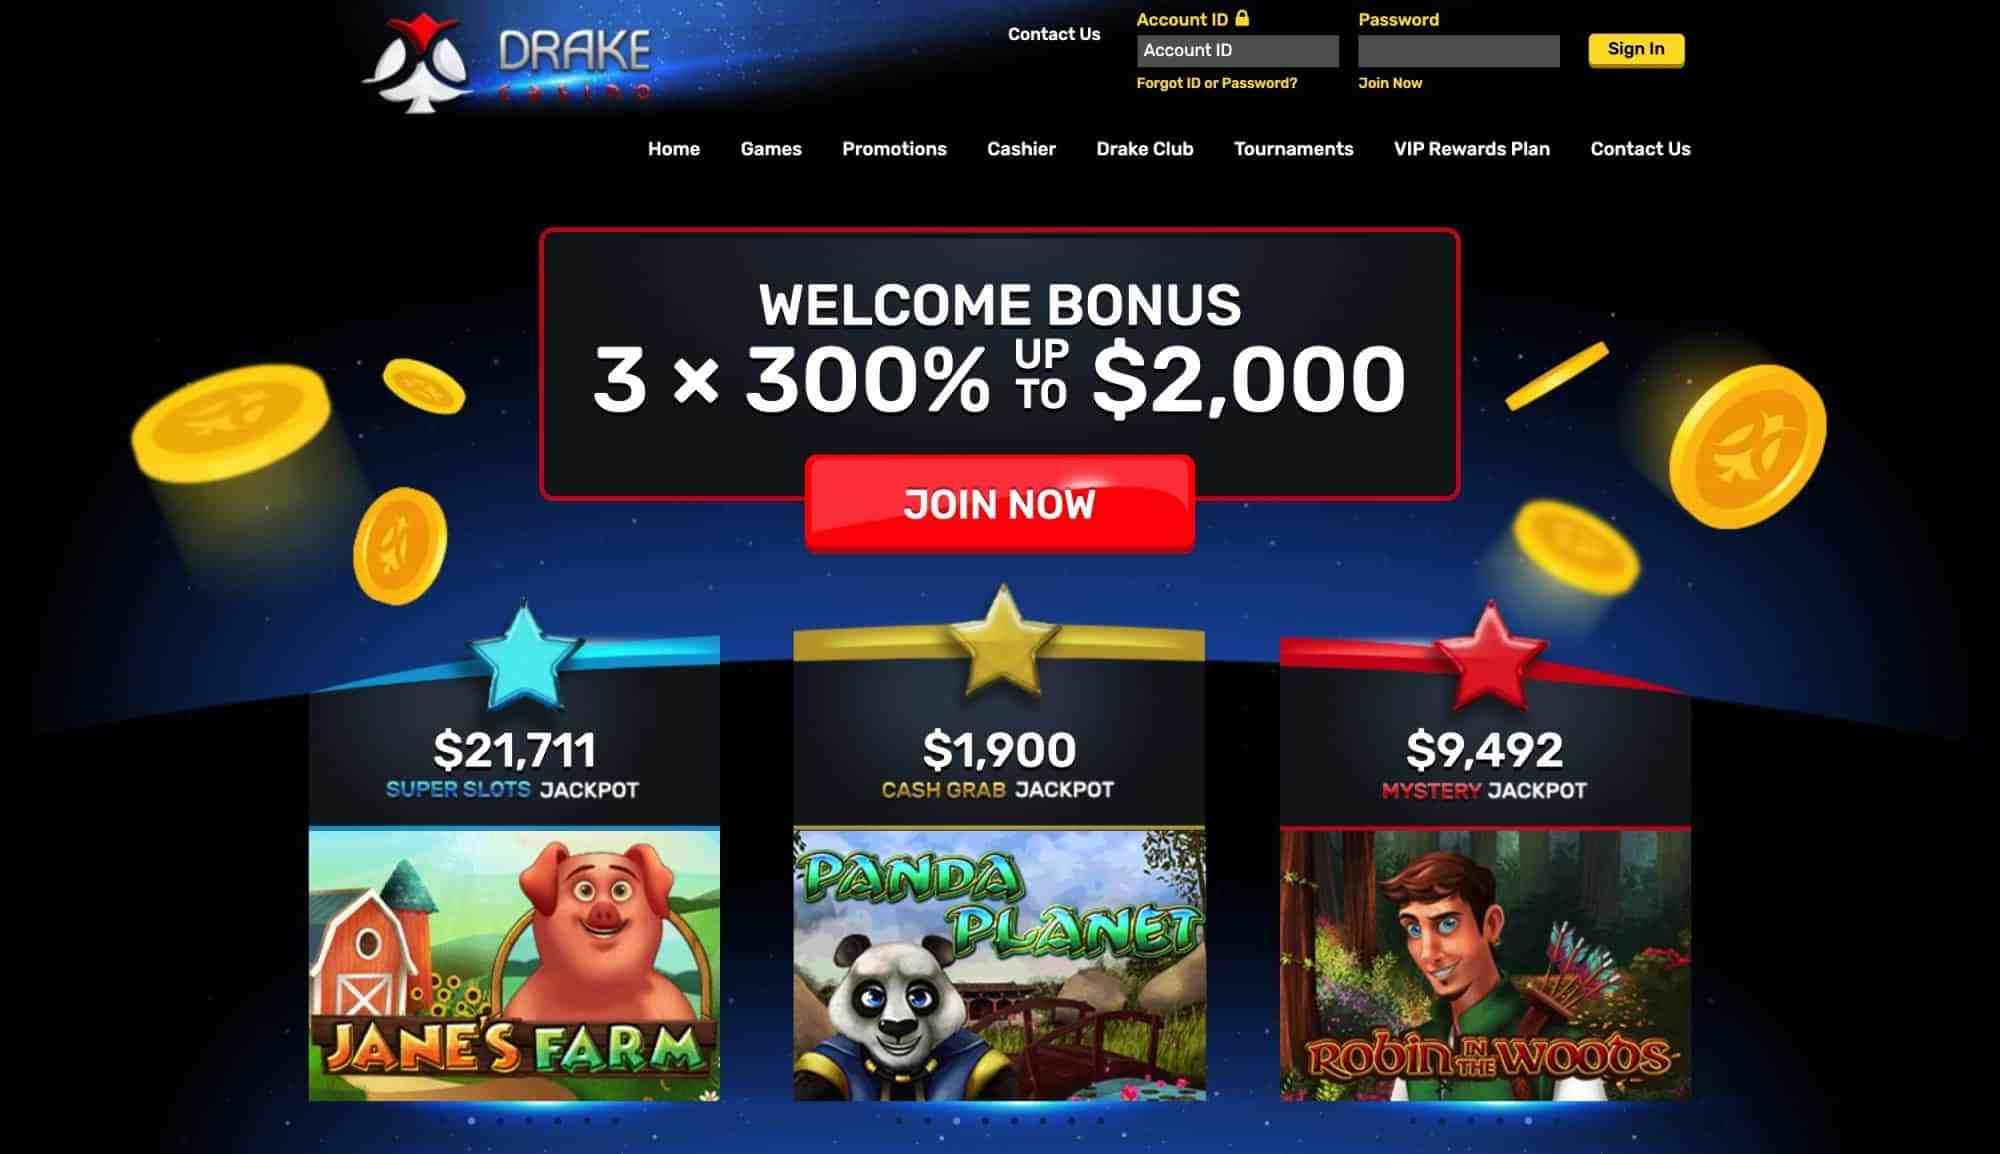 Drake Casino - Claim 540 Spins Or 900% Match Bonus!